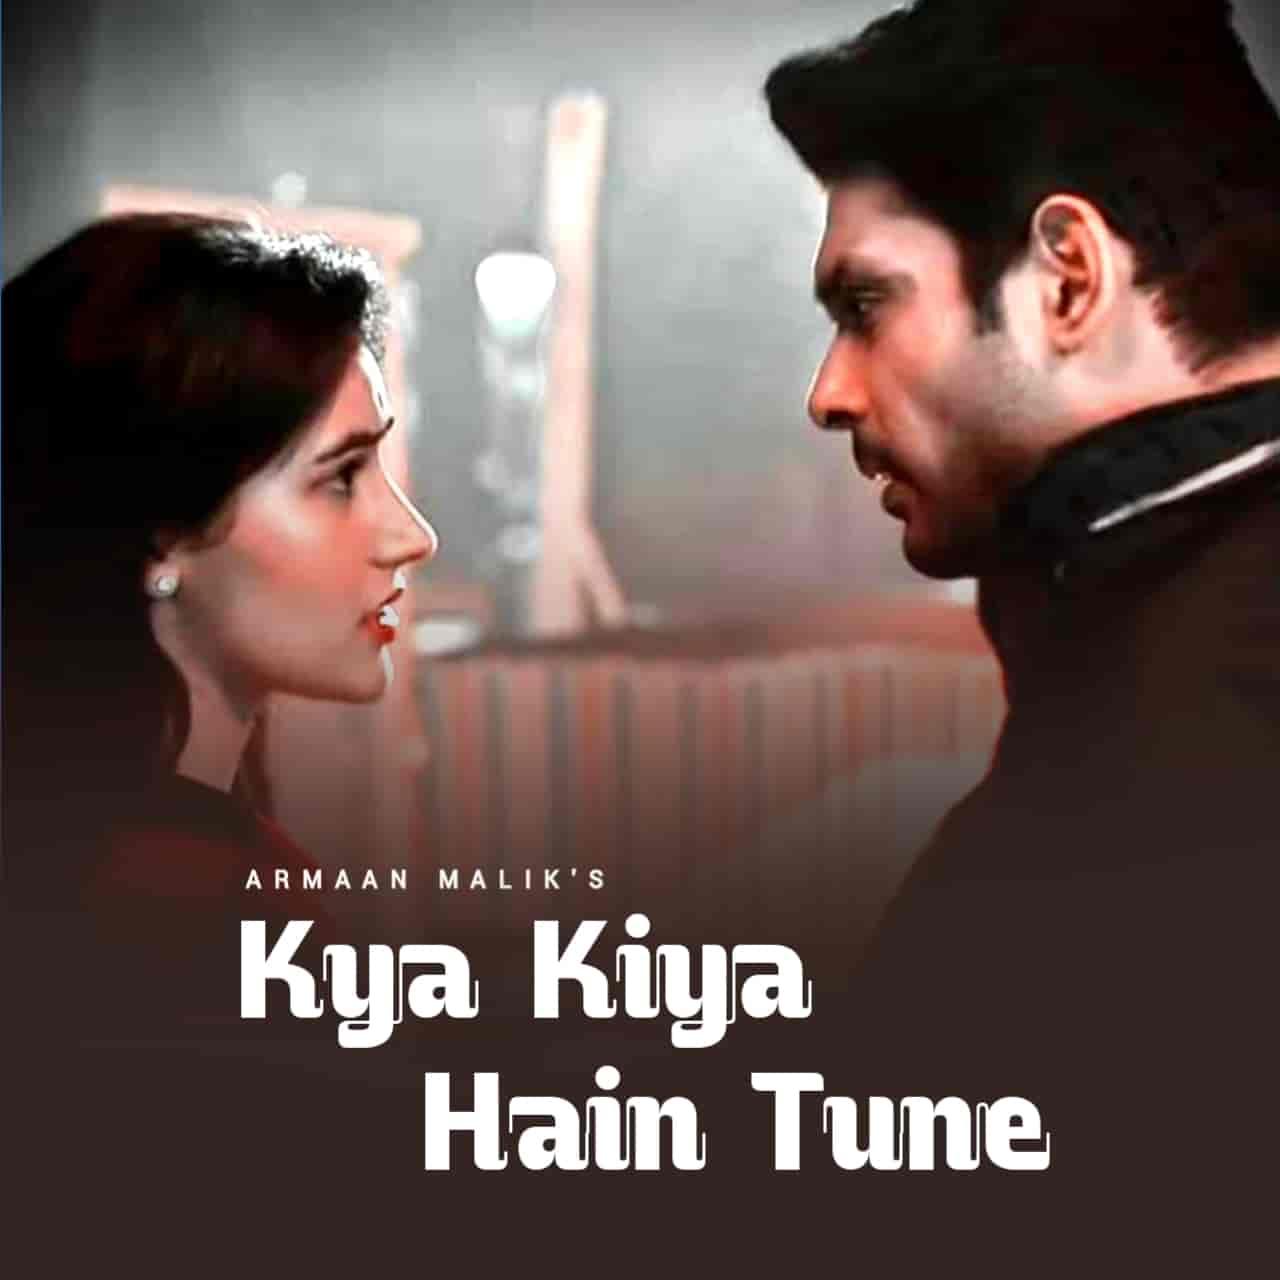 Kya Kiya Hain Tune Hindi Song Lyrics Armaan Malik From Album Broken But Beautiful Season 3